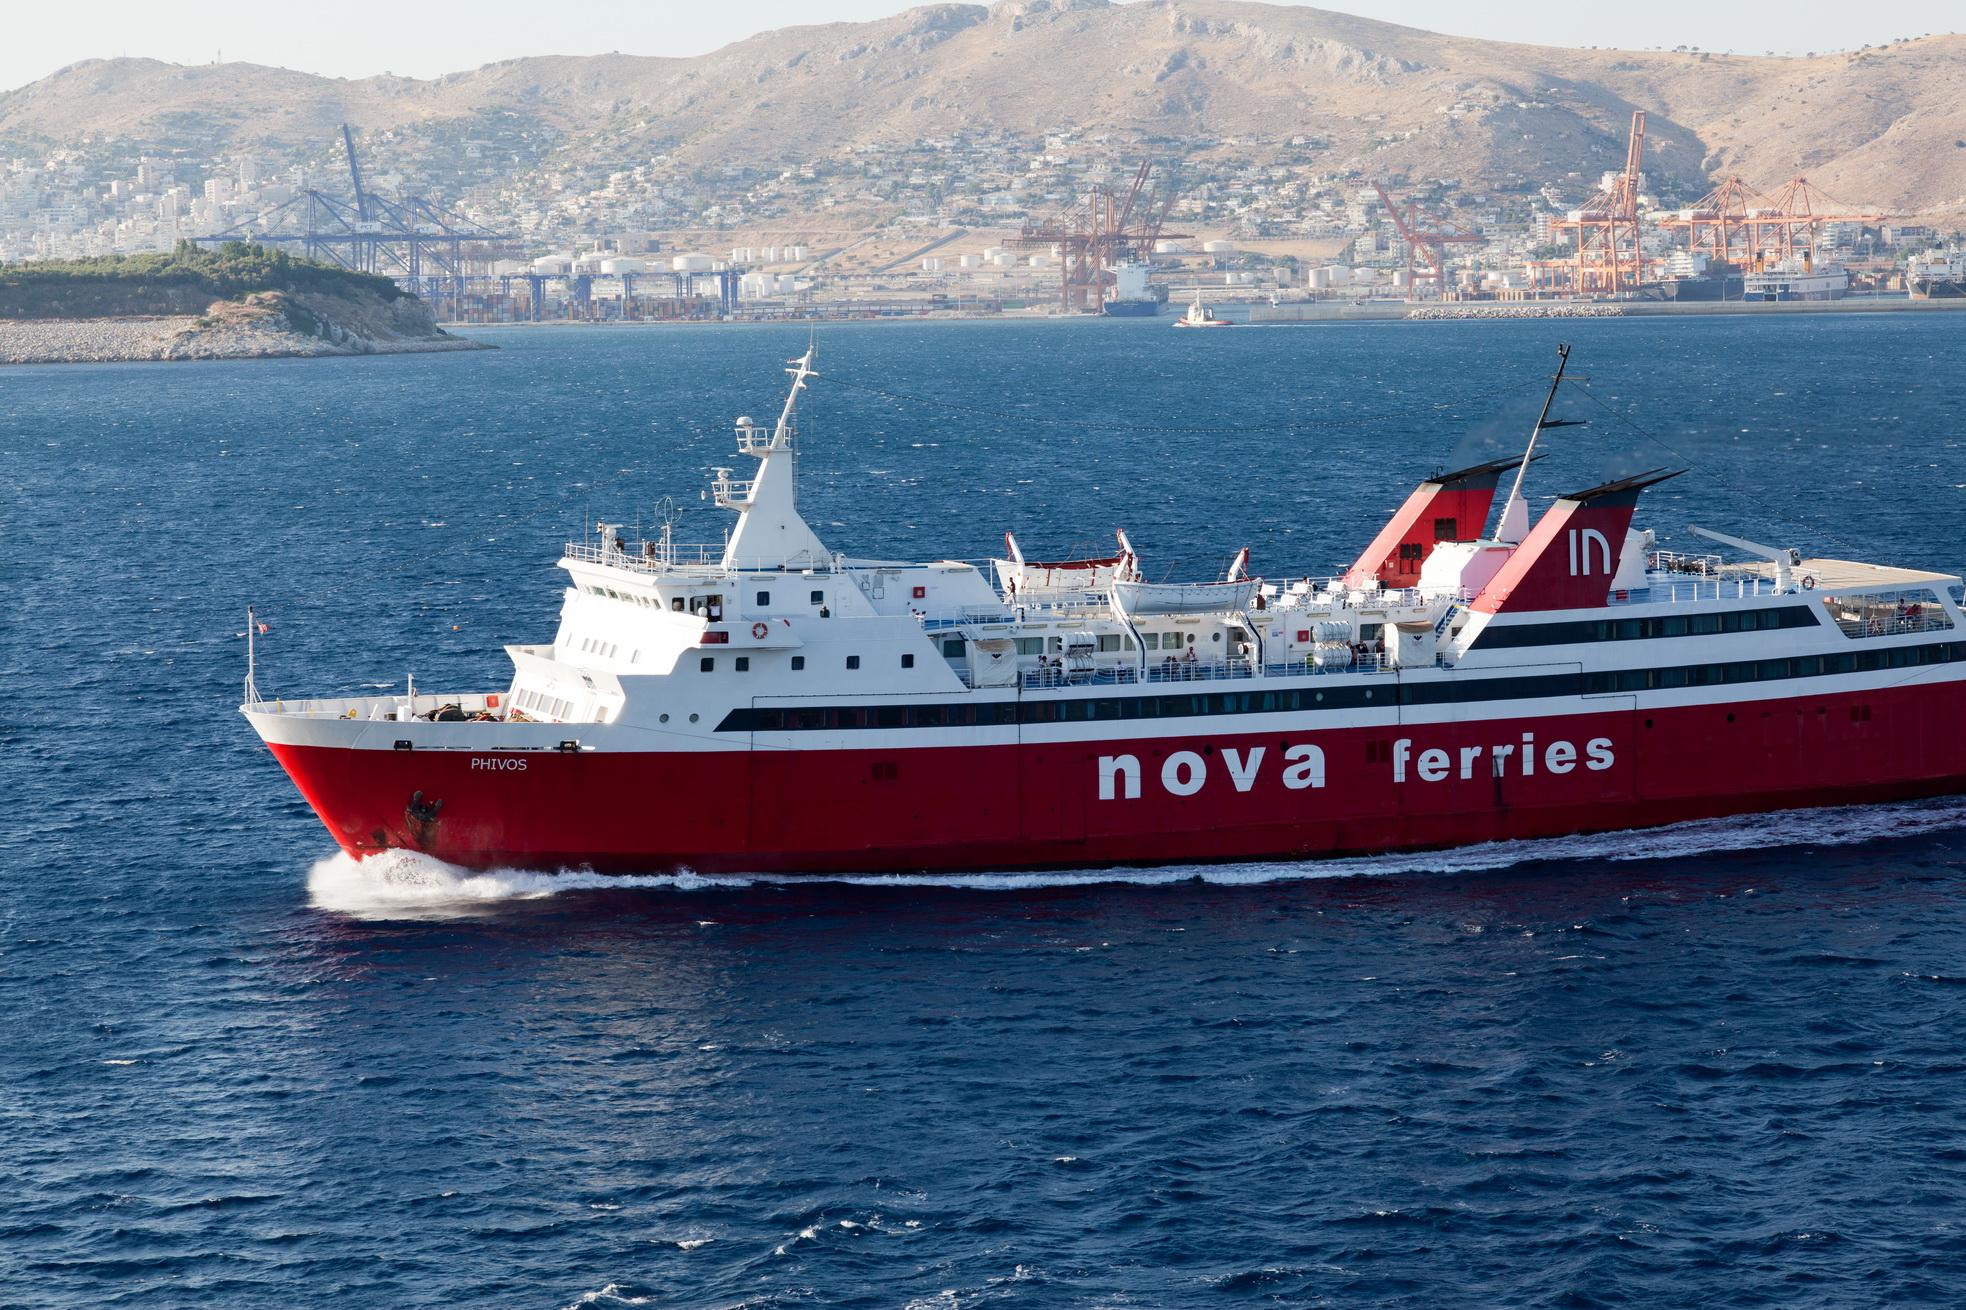 MS Phivos IMO 7825978 Nova Ferries leaving Piraeus Port of Athens Greece 04